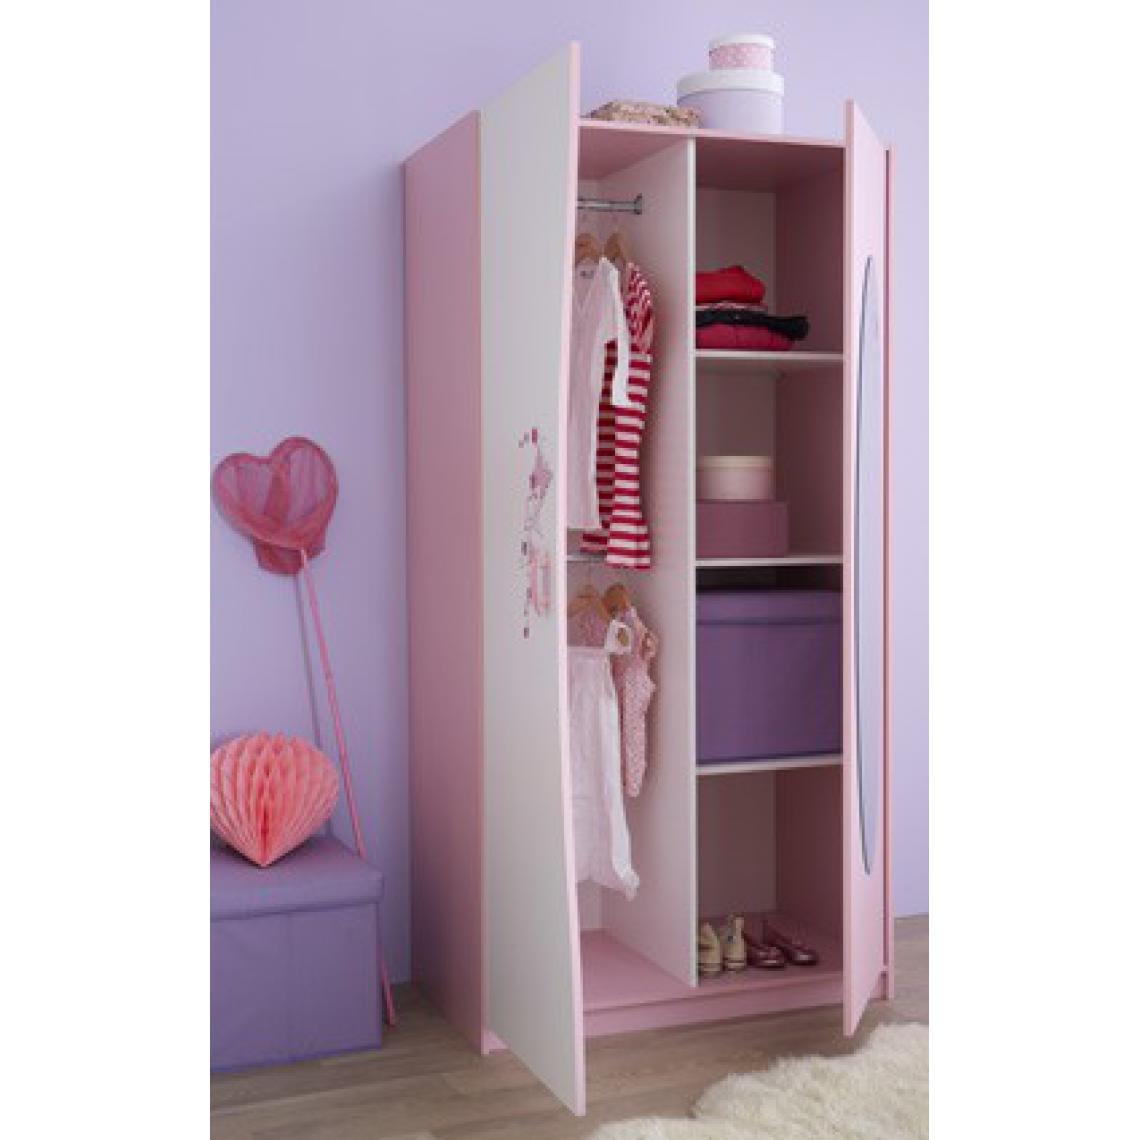 Armoire 2 portes avec miroir rose pastel blanc perle PIAMA